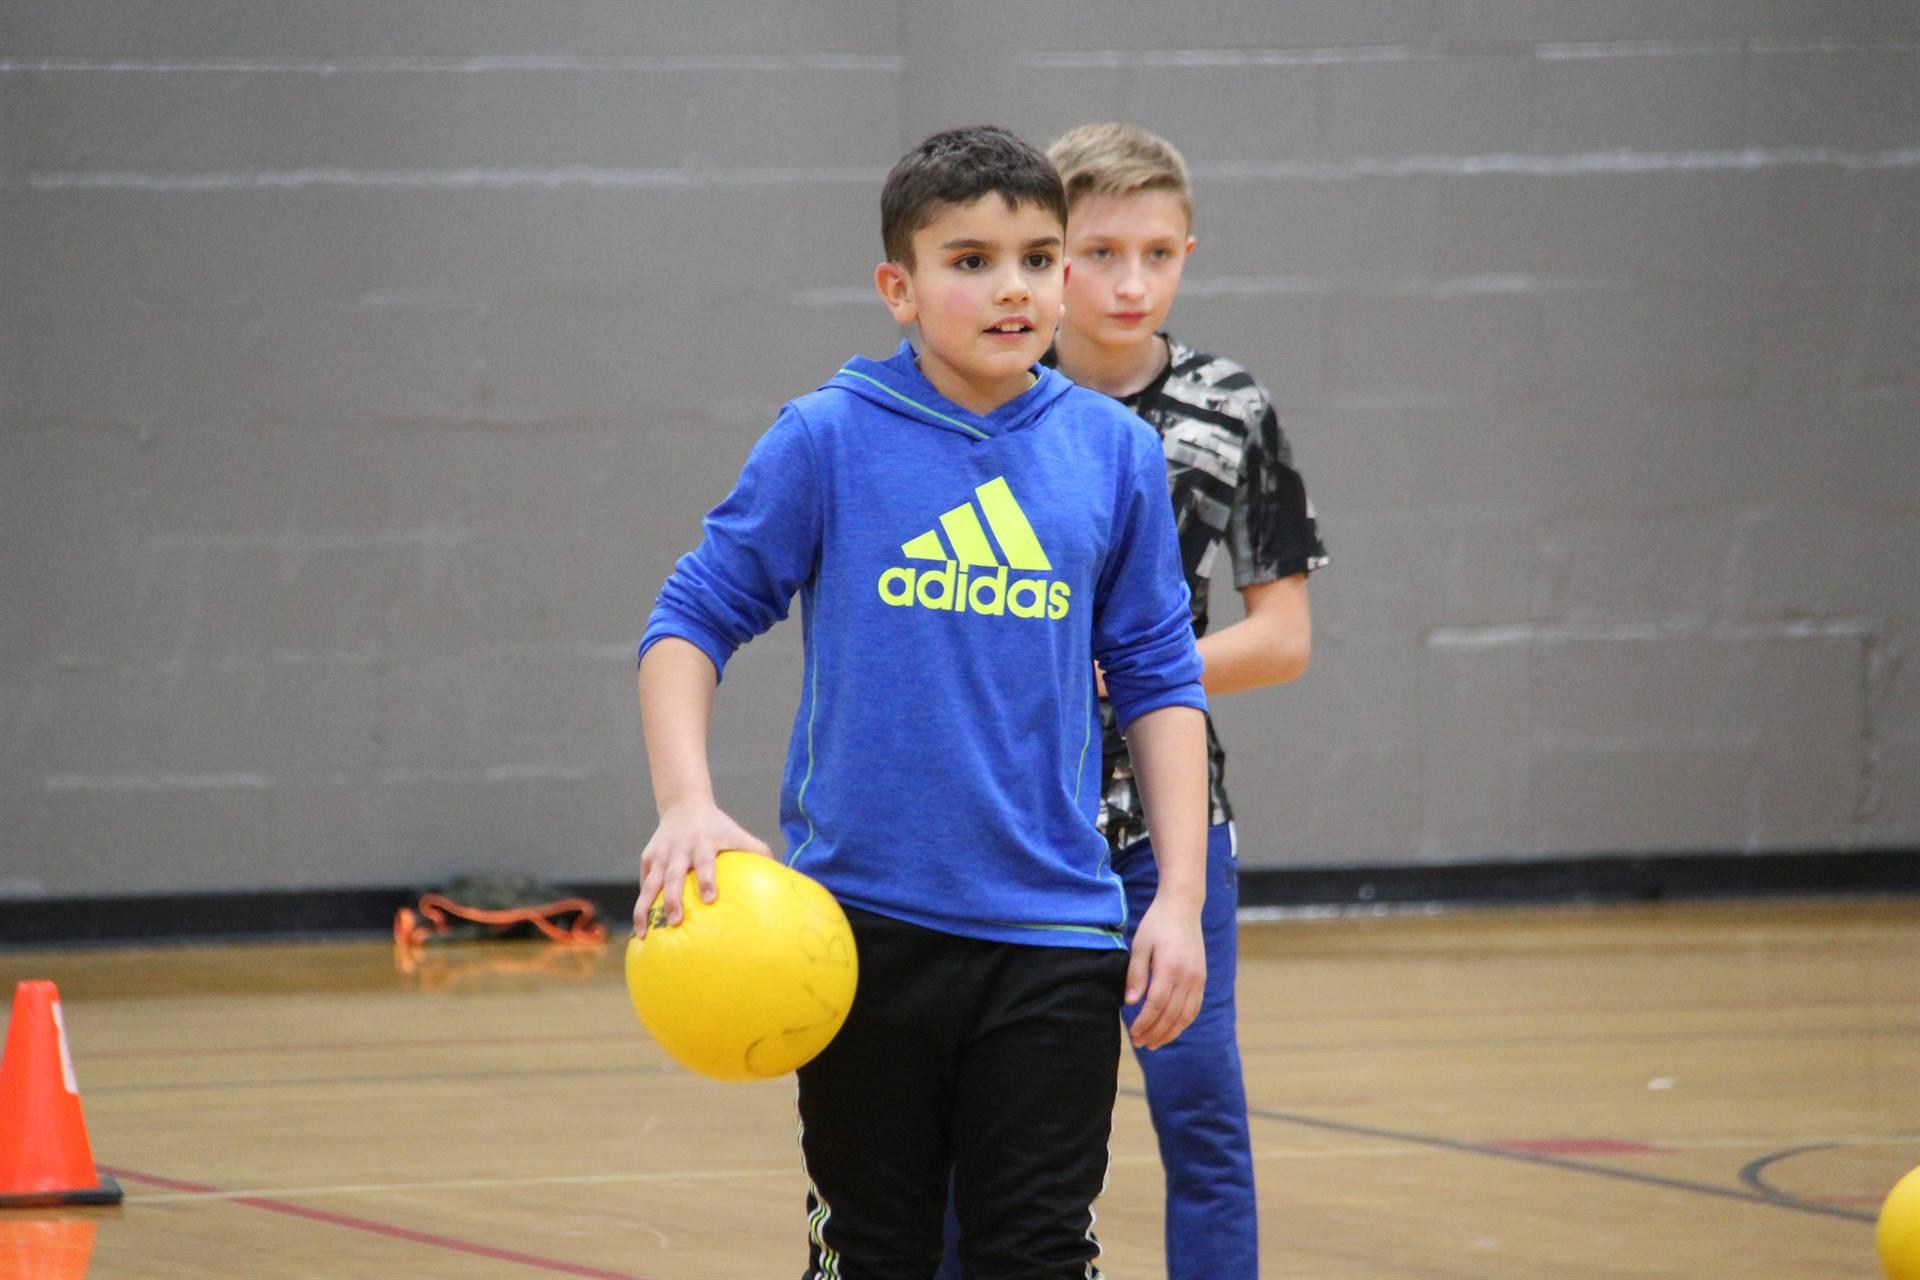 student holding dodgeball